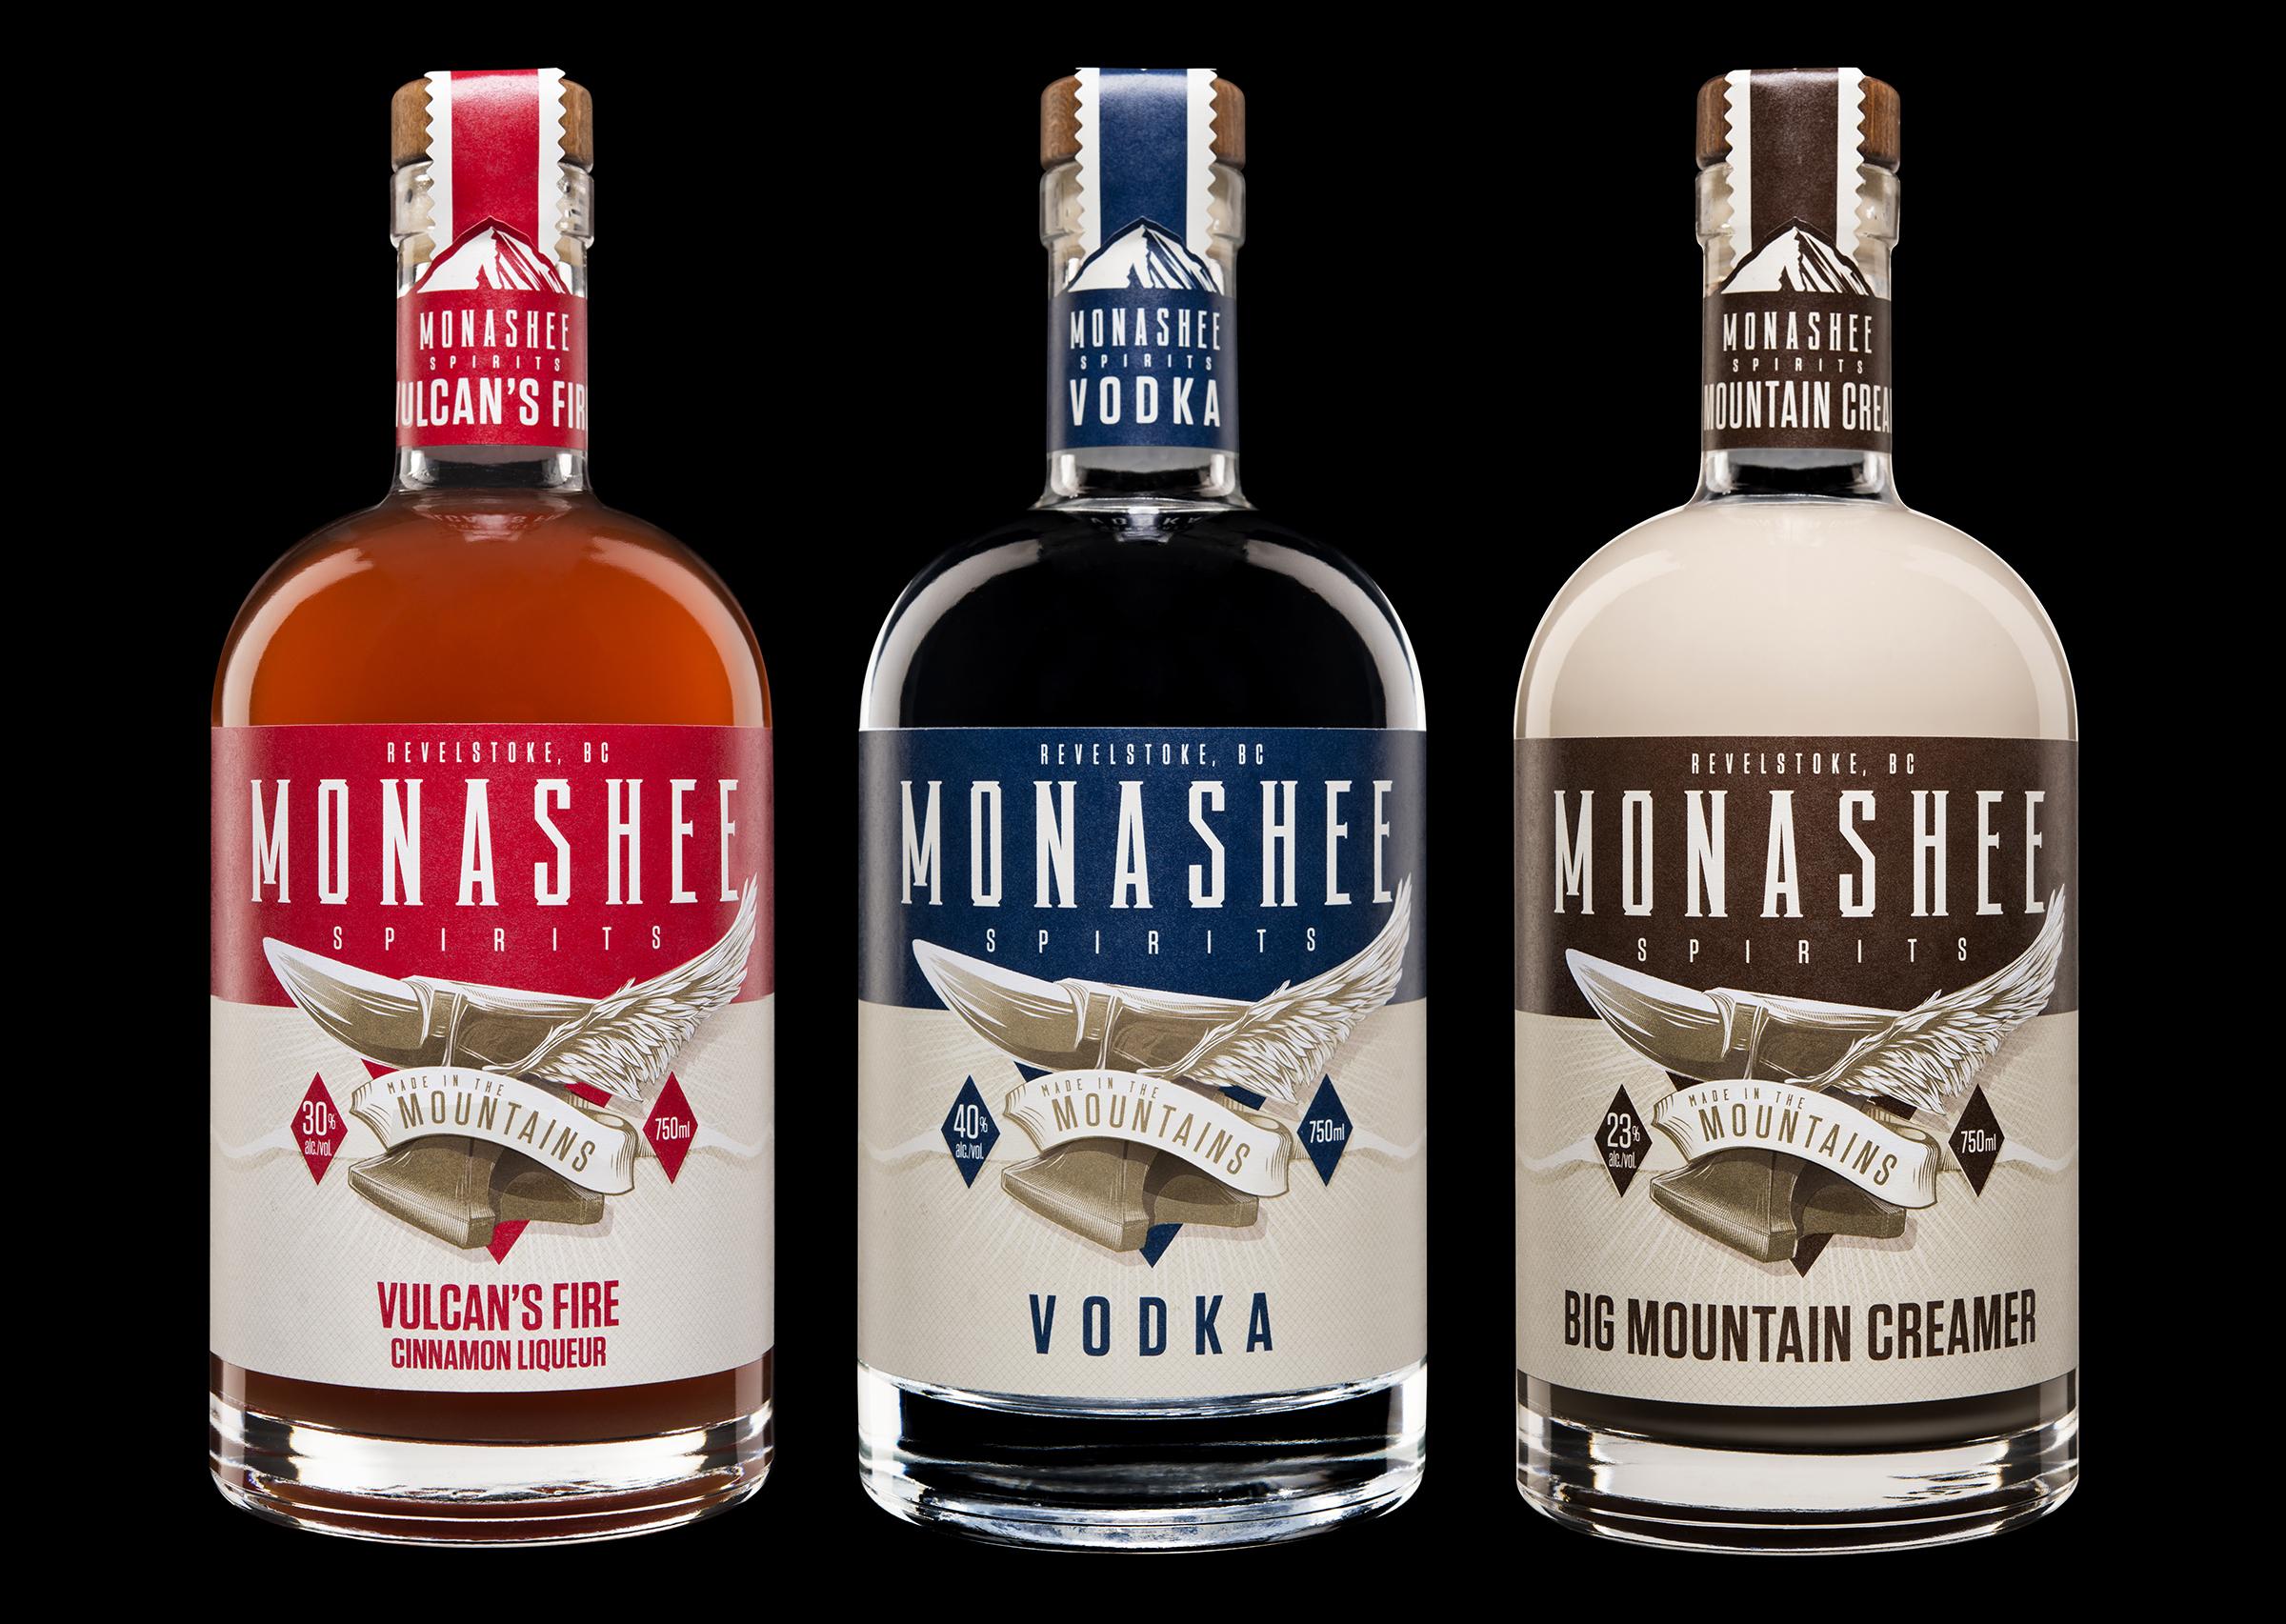 monashee-02.jpg